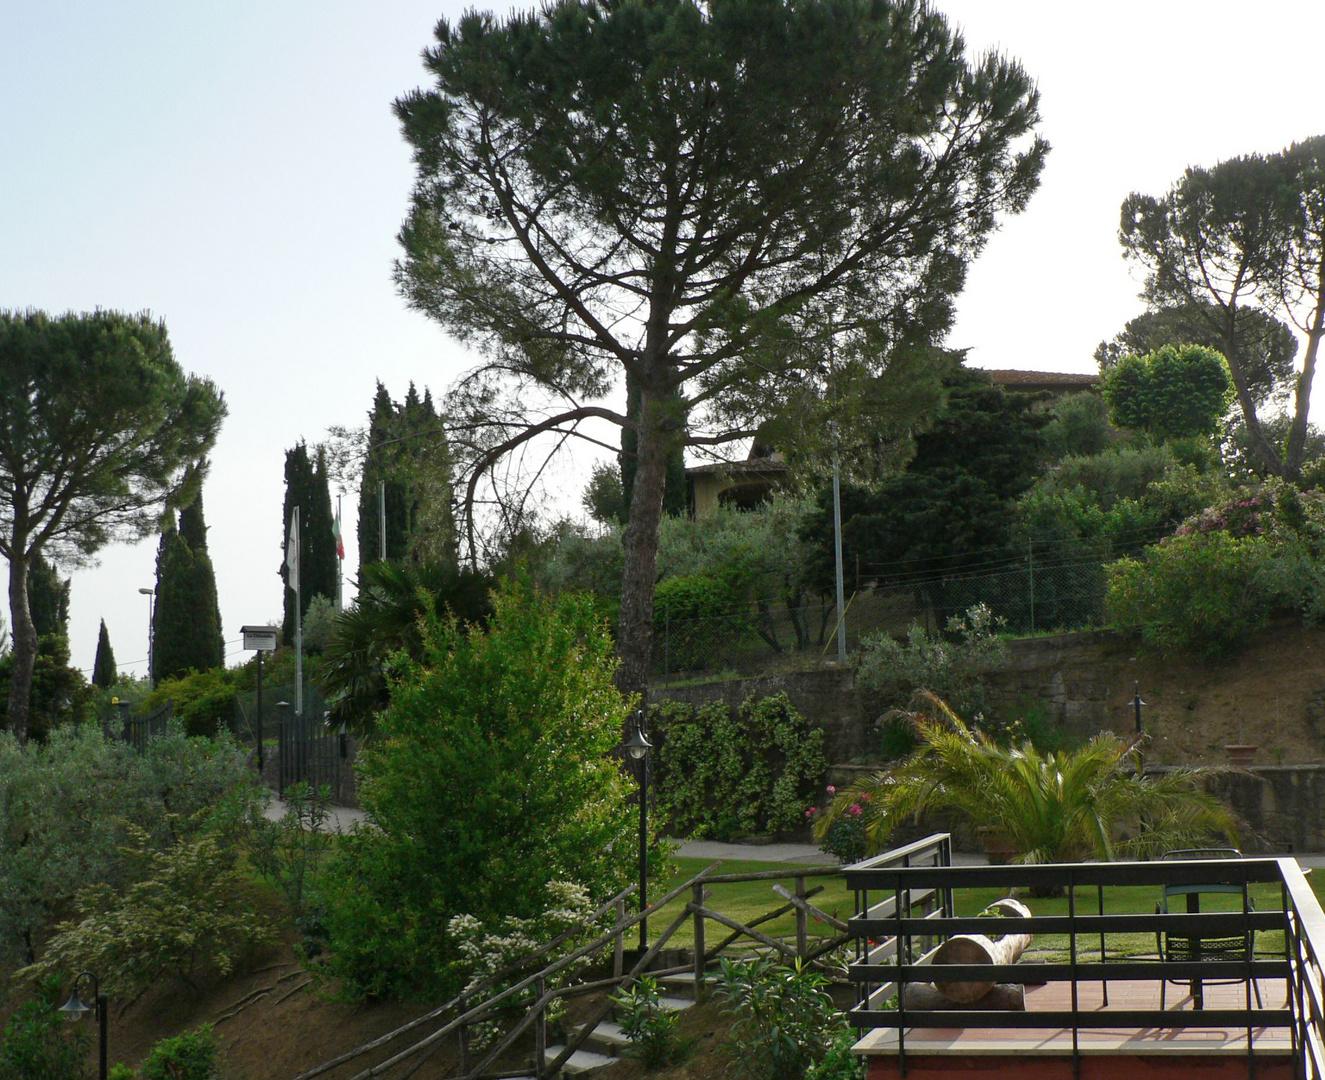 The Garden of La Cittadella